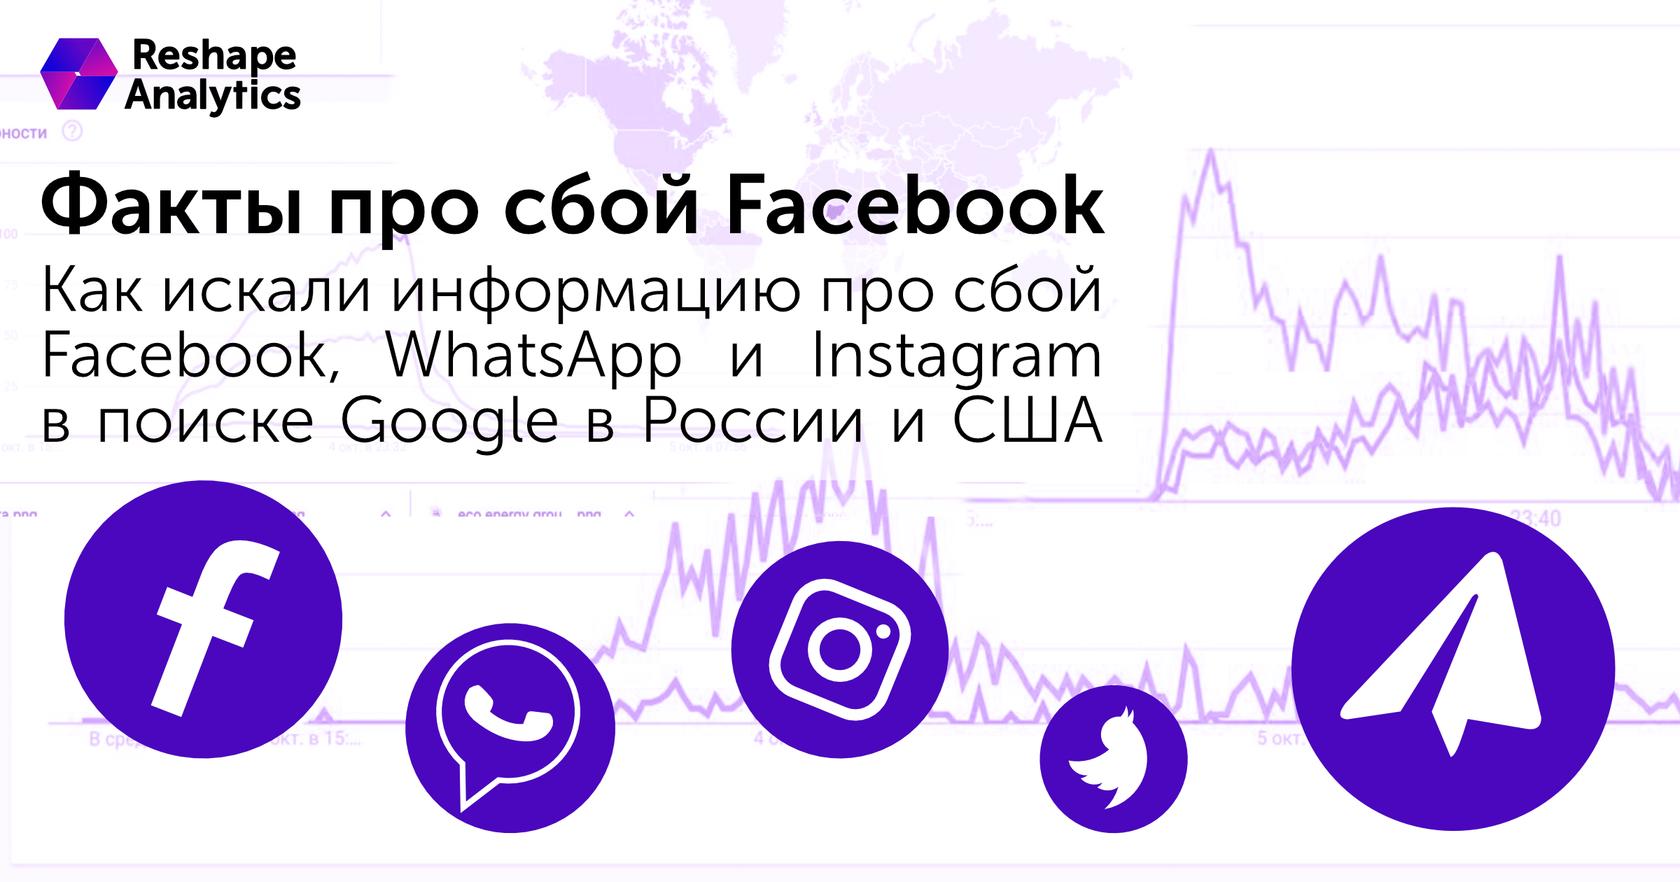 Факты про сбой Facebook, Instagram, WhatsApp